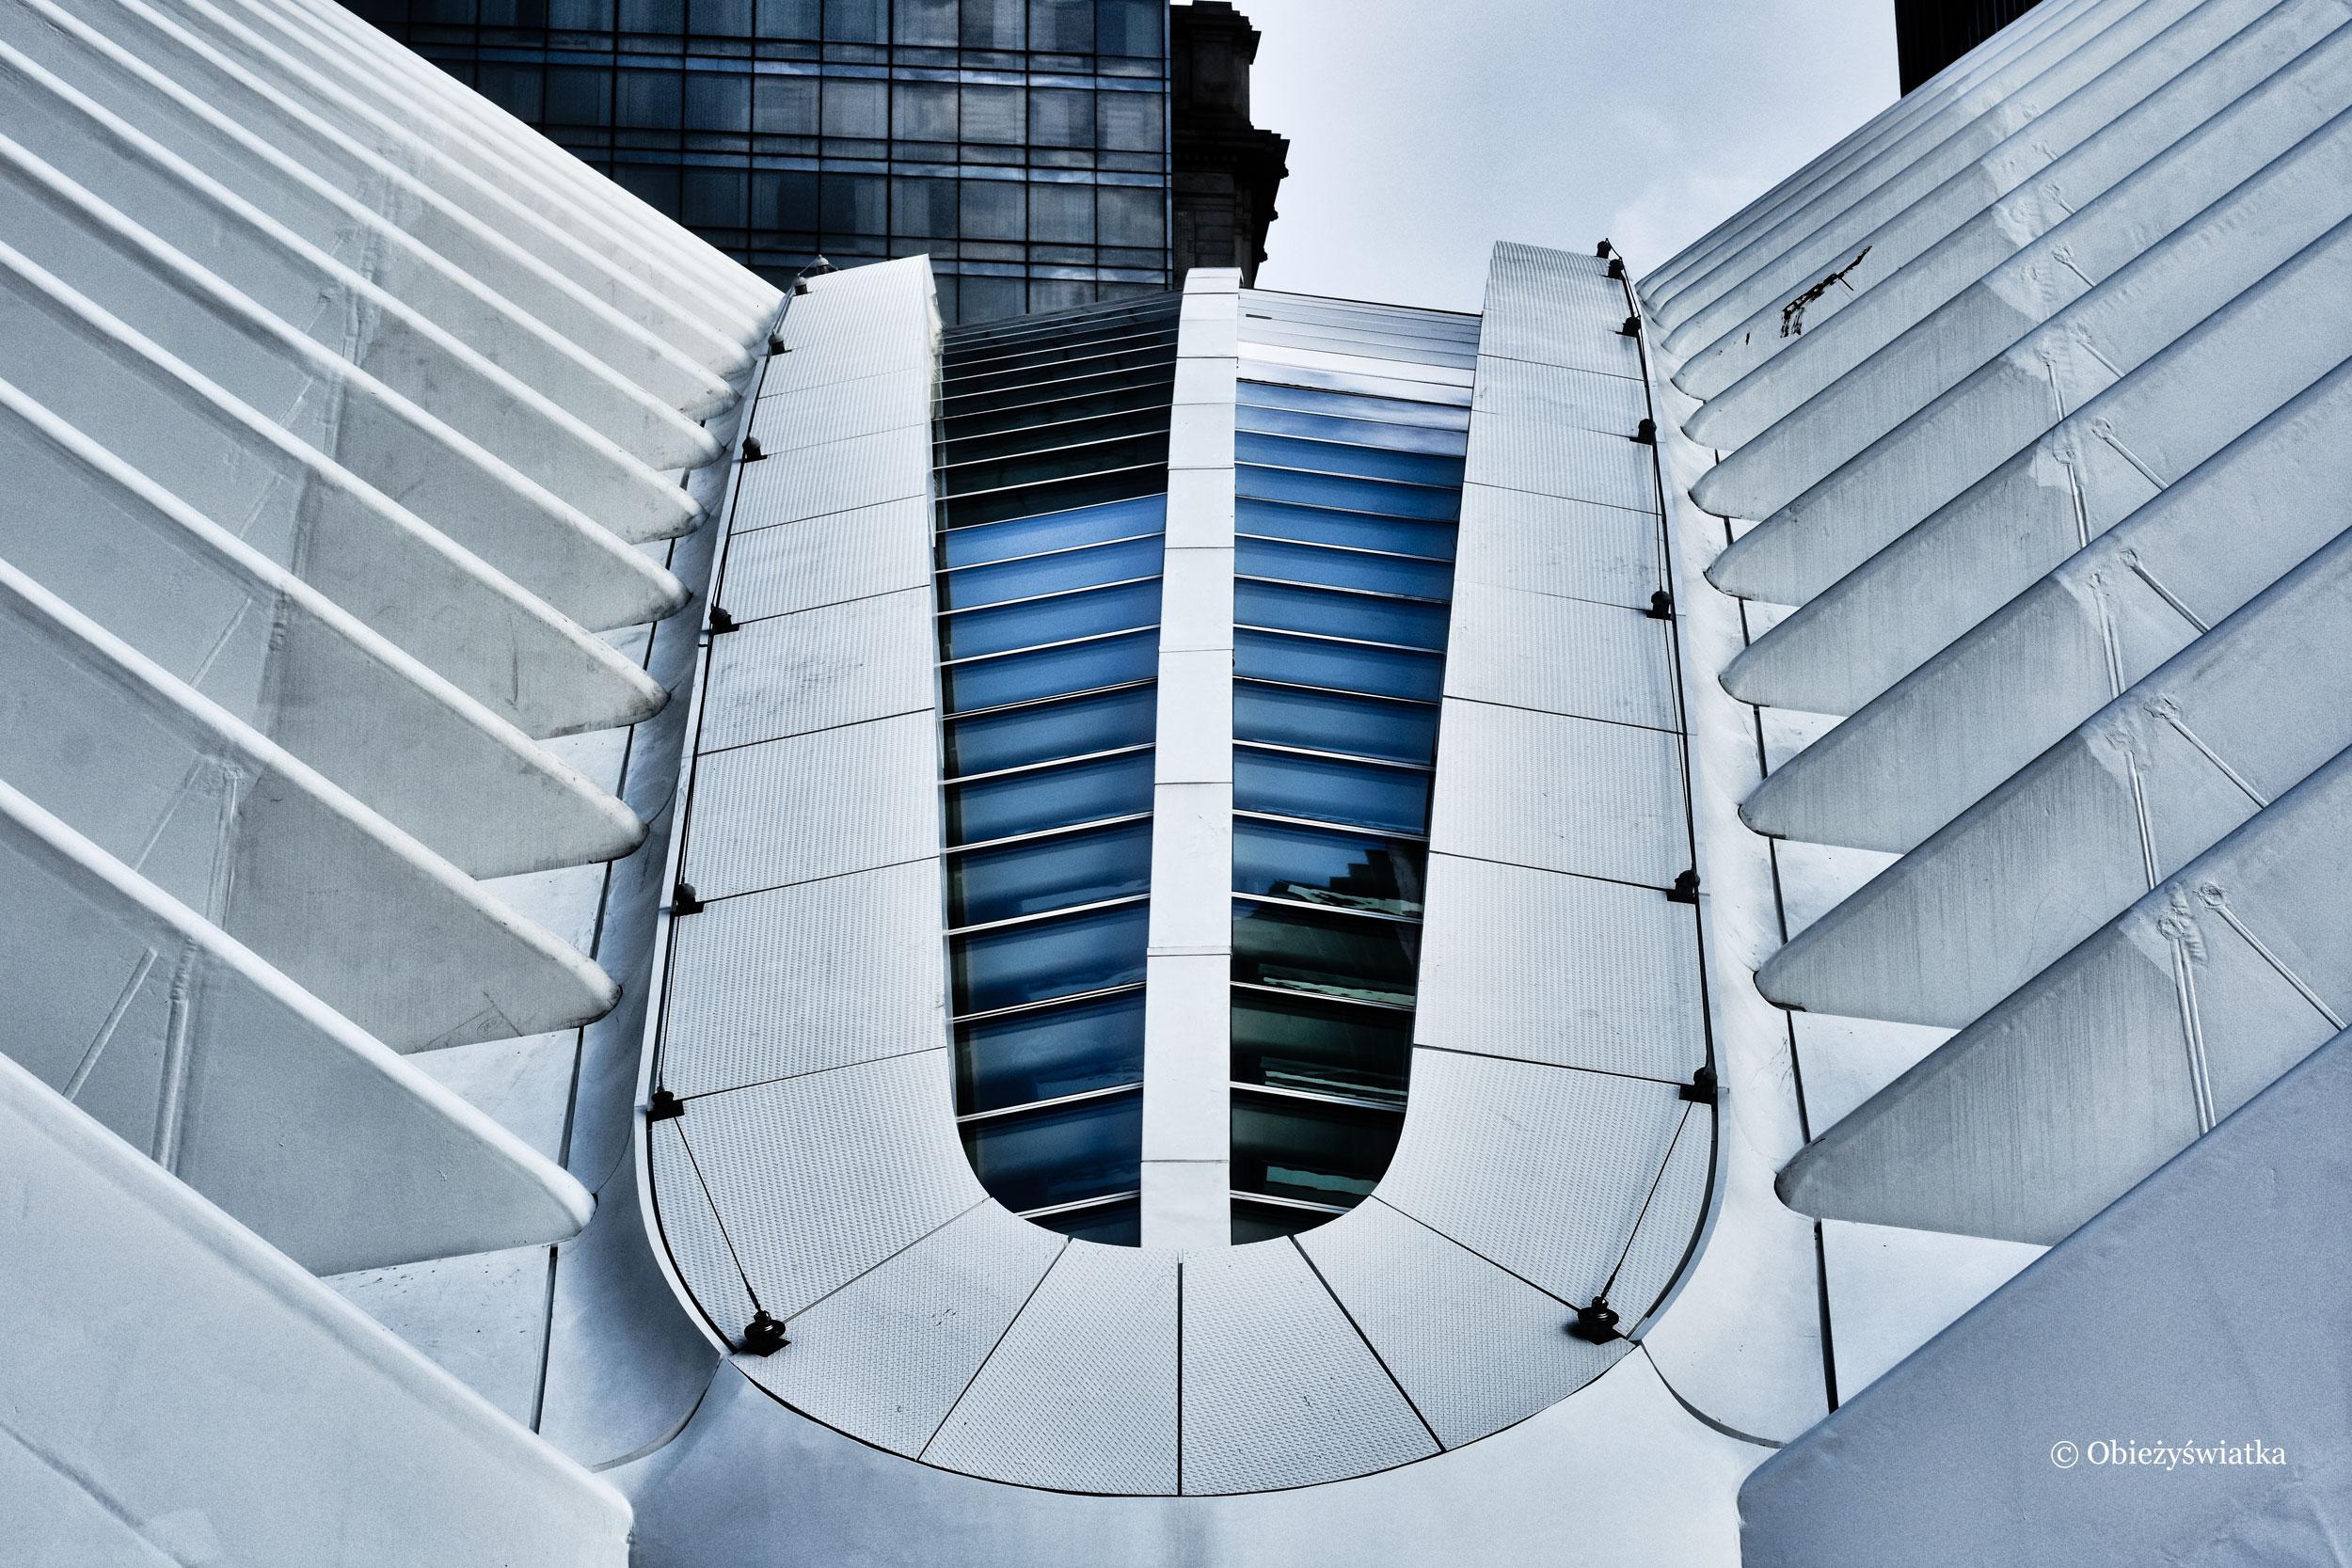 Stacja metra, Nowy Jork, World Trade Center